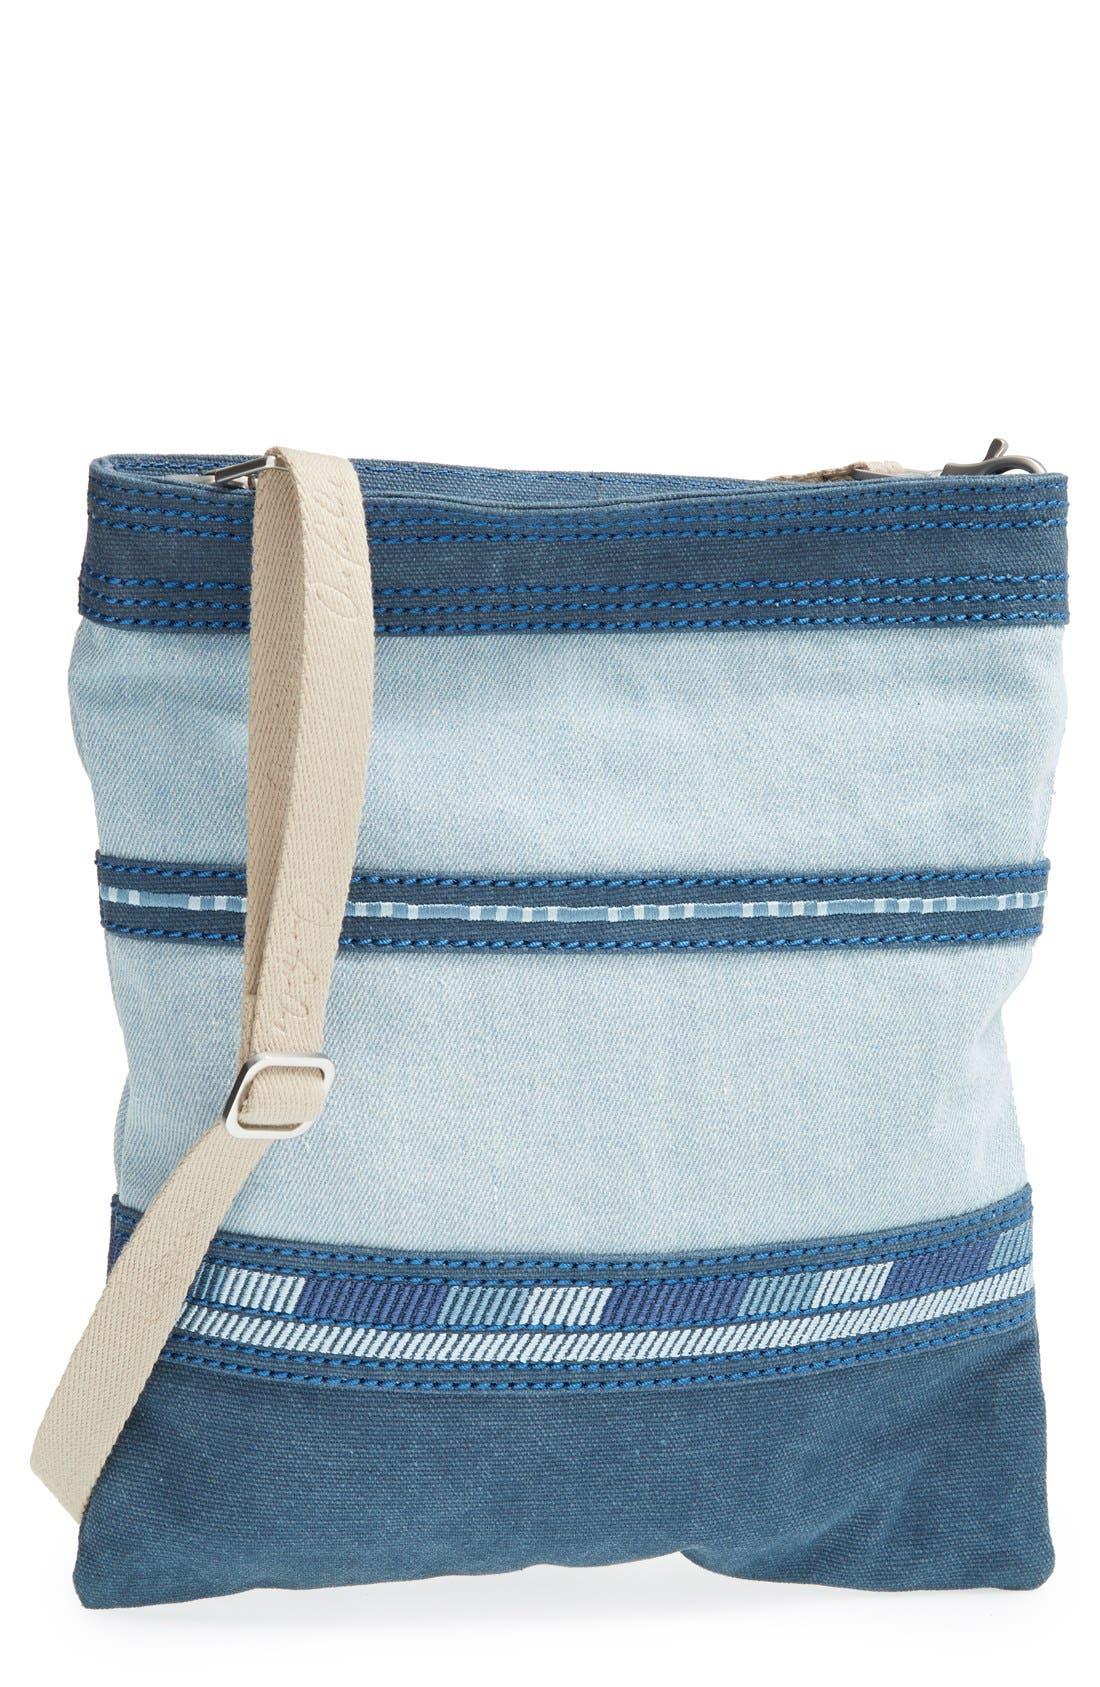 Main Image - TOMS Stripe Denim Crossbody Bag